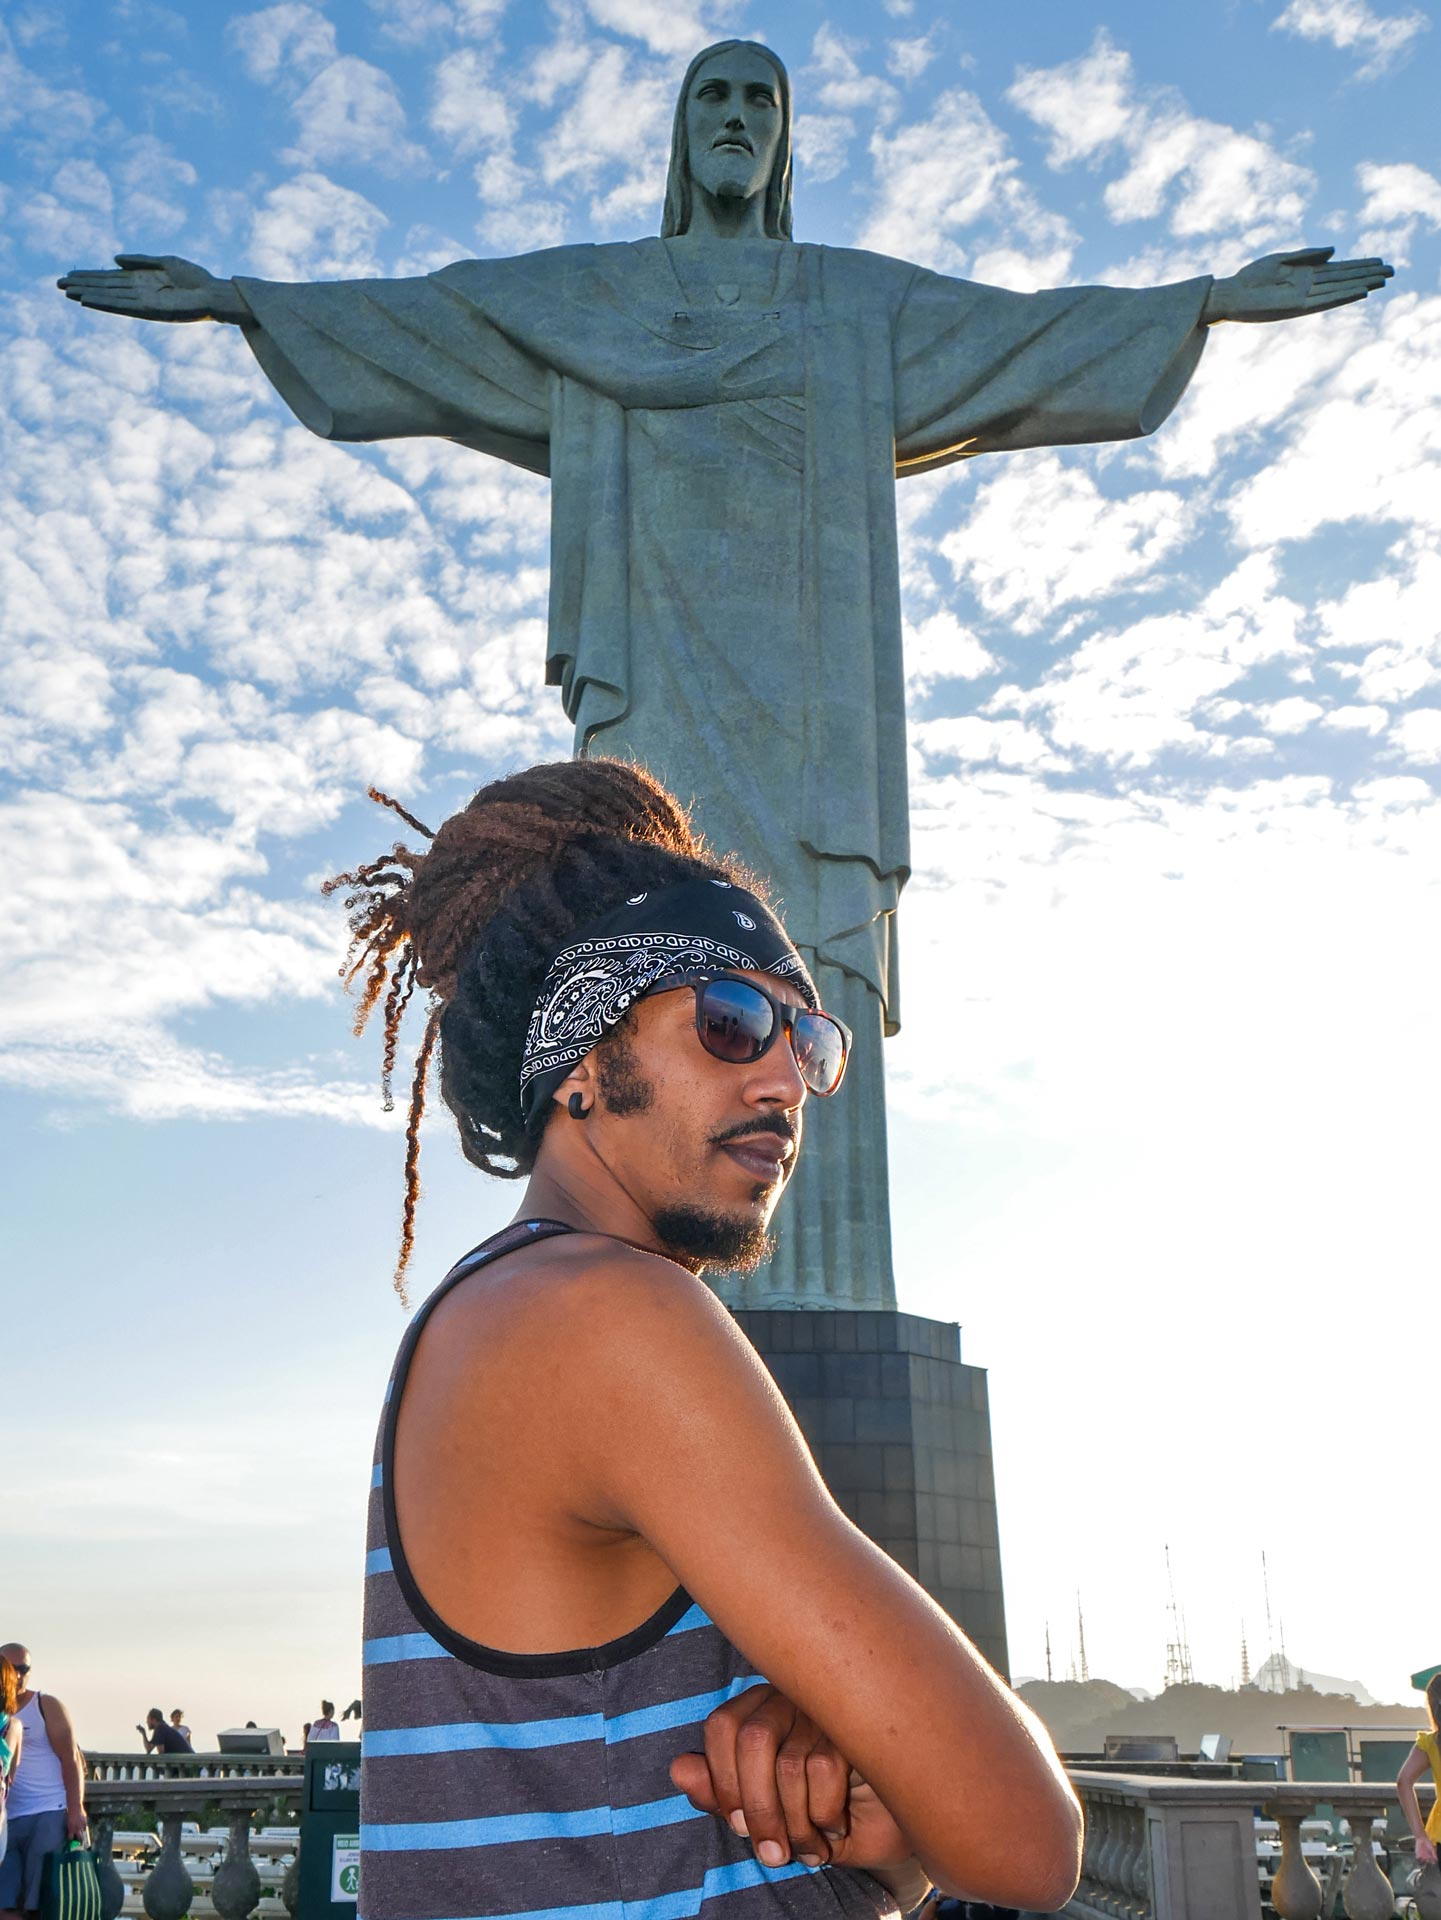 Rastaman in front of Christ the Redeemer in Rio de Janeiro, Brazil